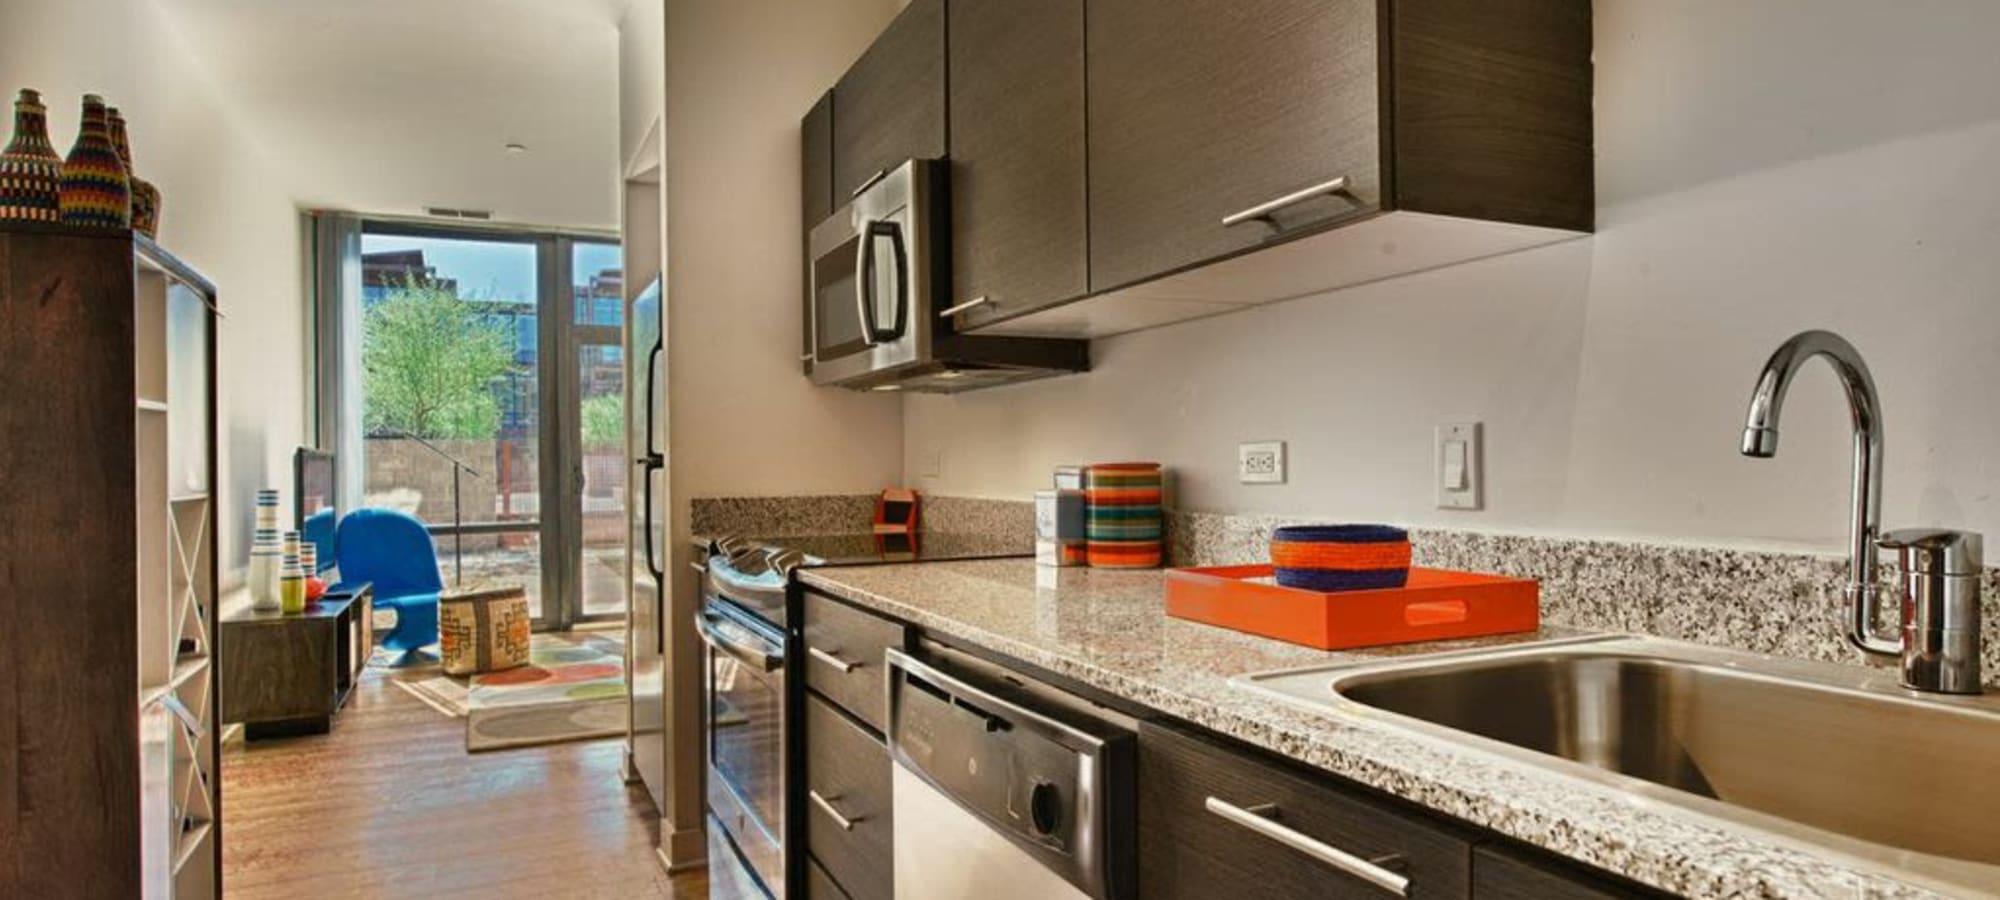 Luxury kitchen at Domus in Phoenix, Arizona